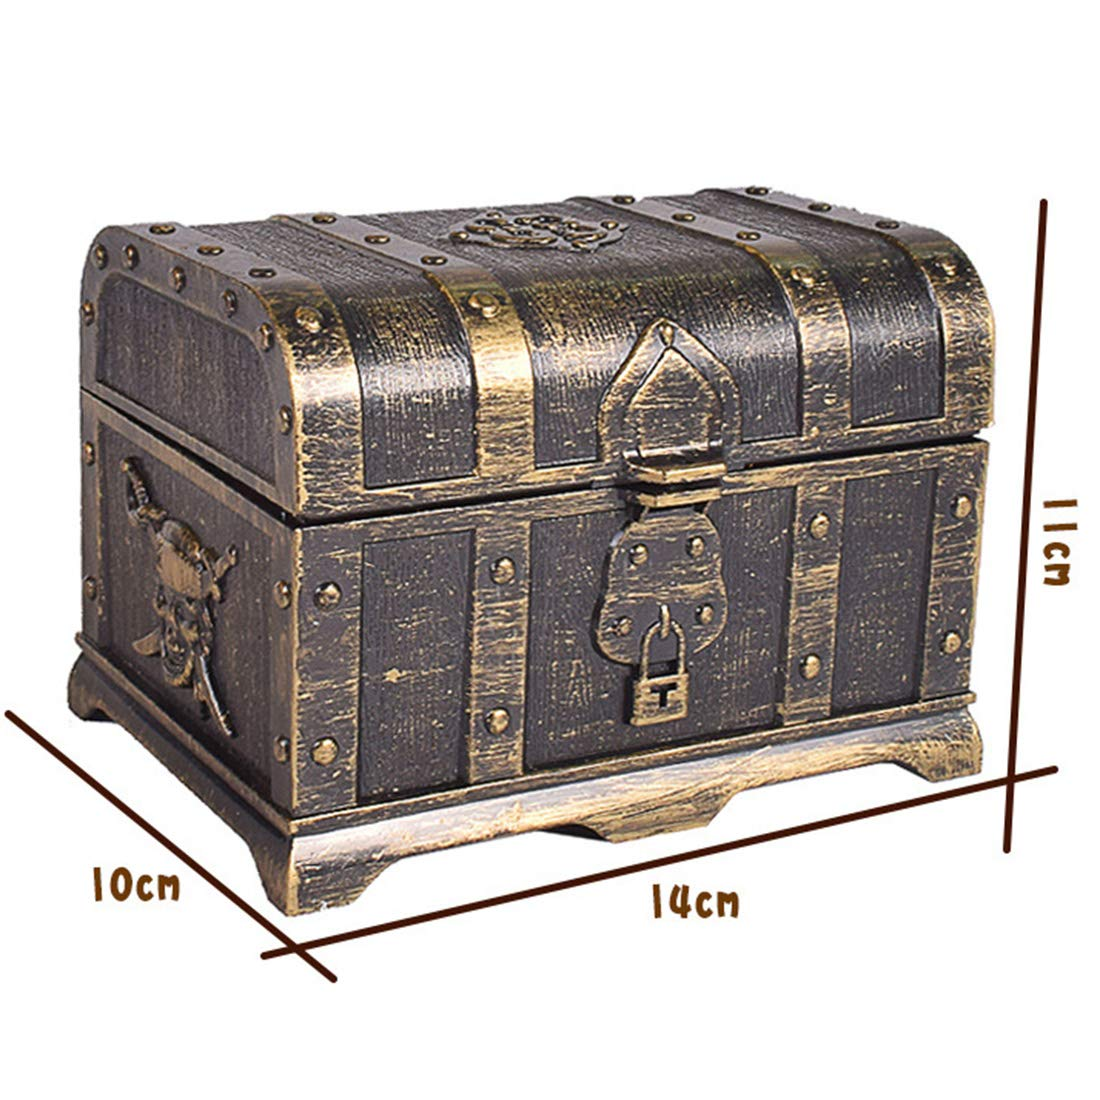 Empty Box Yamix Pirate Haunted Treasure Box Treasure Chest Box Jewelry Box Jewelry Storage,Cards Collection,Gifts Home Decoration